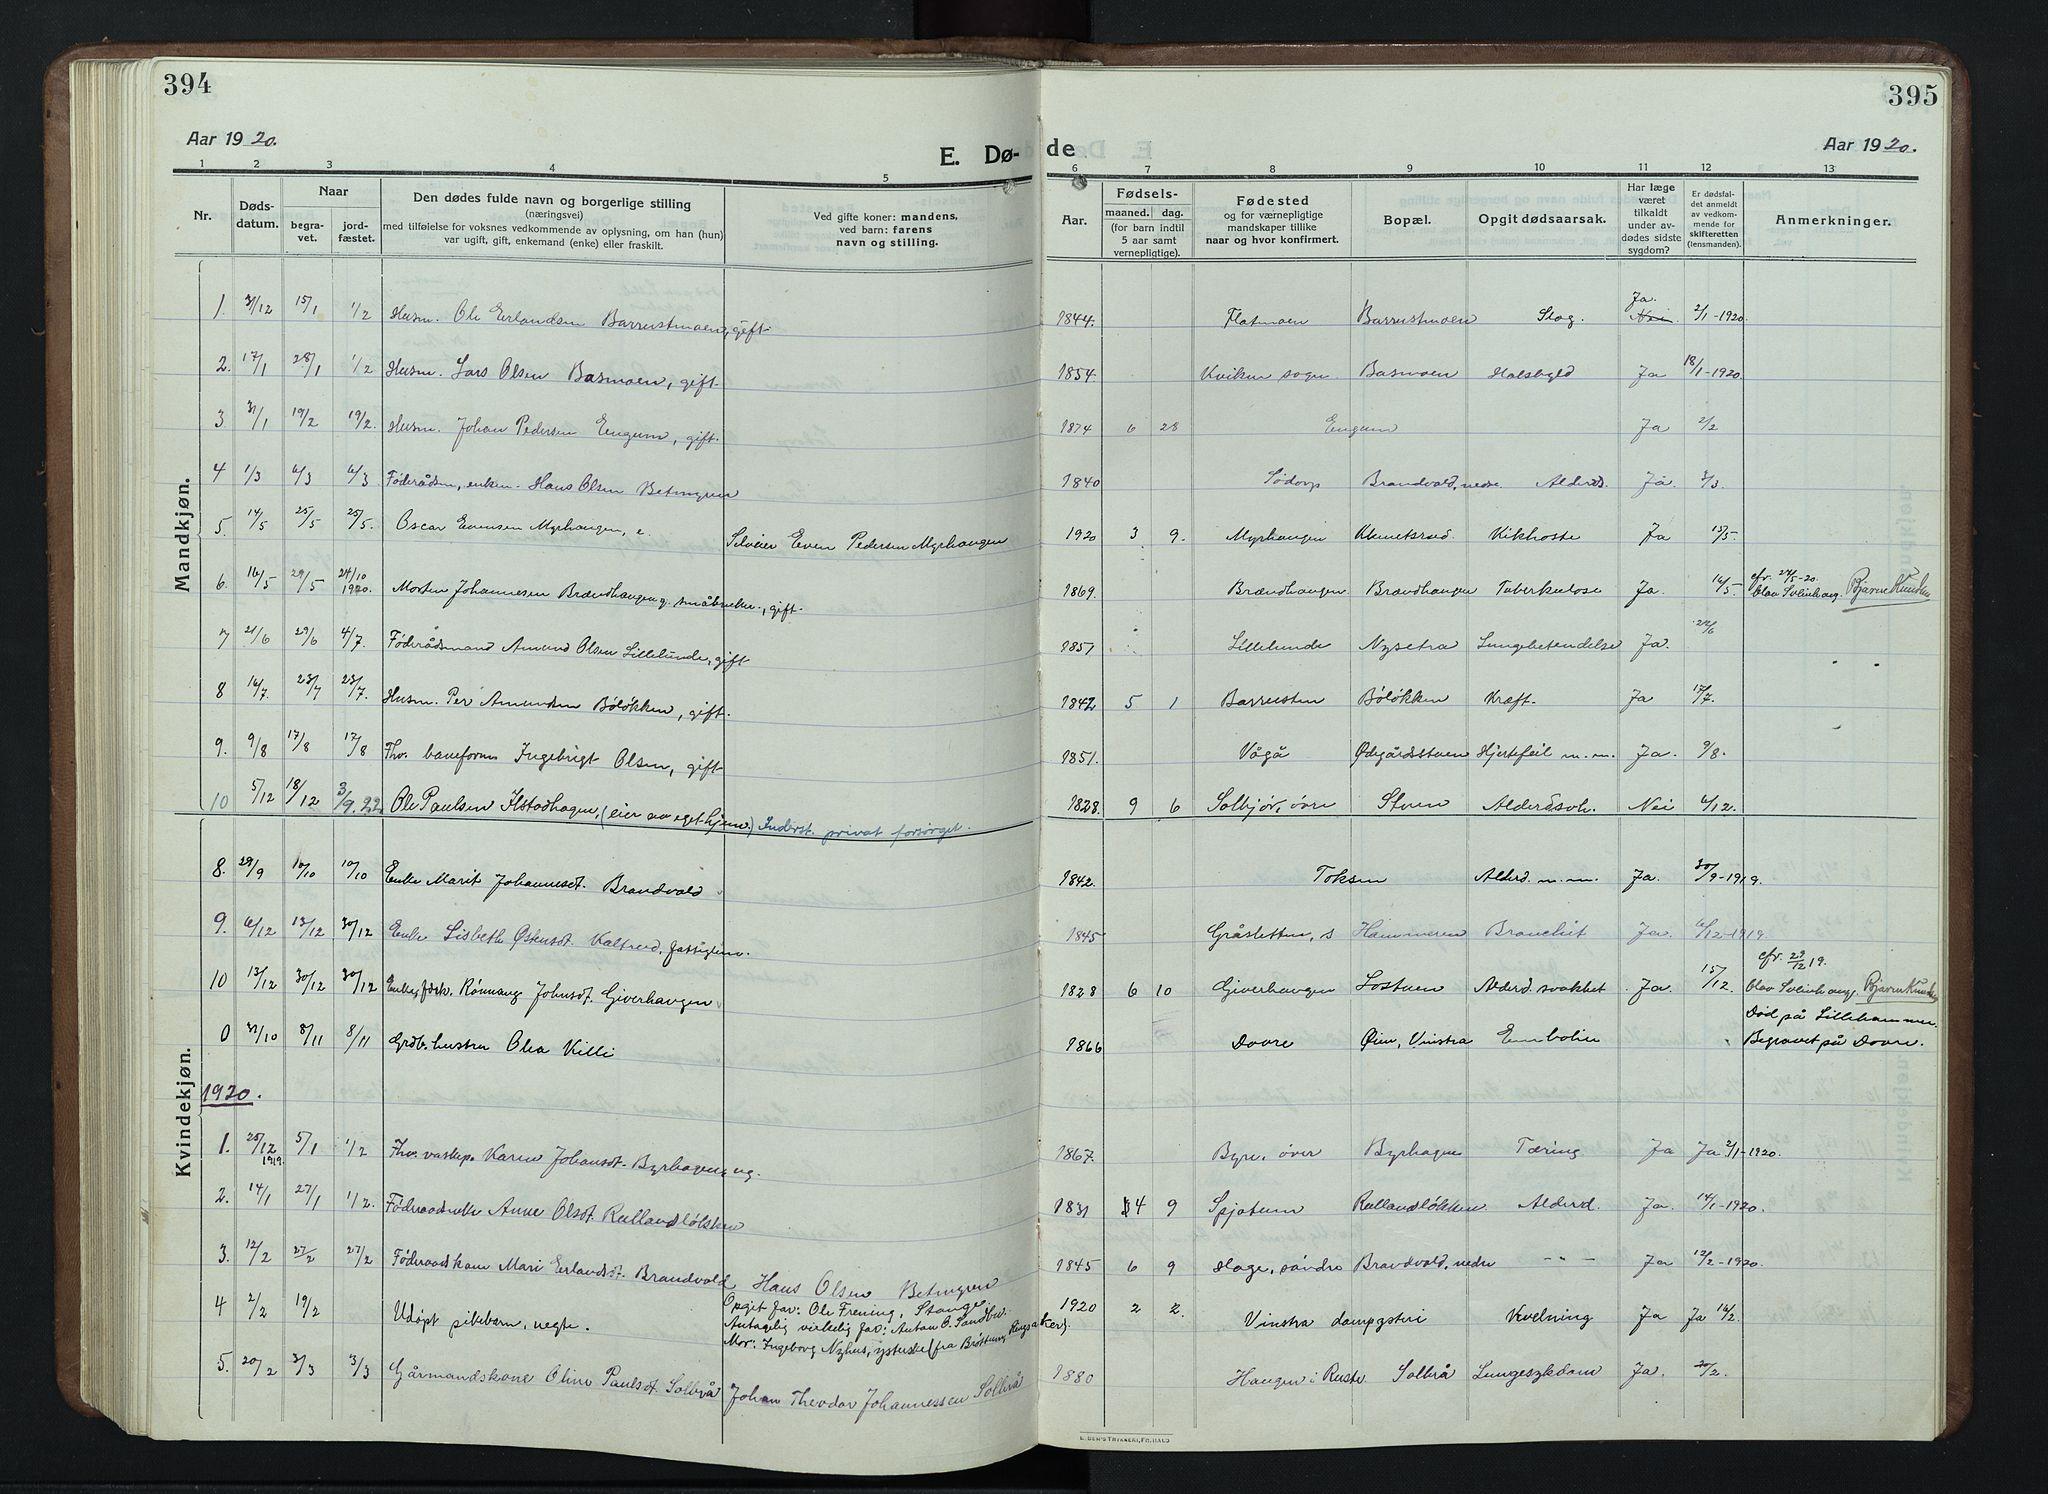 SAH, Nord-Fron prestekontor, Klokkerbok nr. 7, 1915-1946, s. 394-395